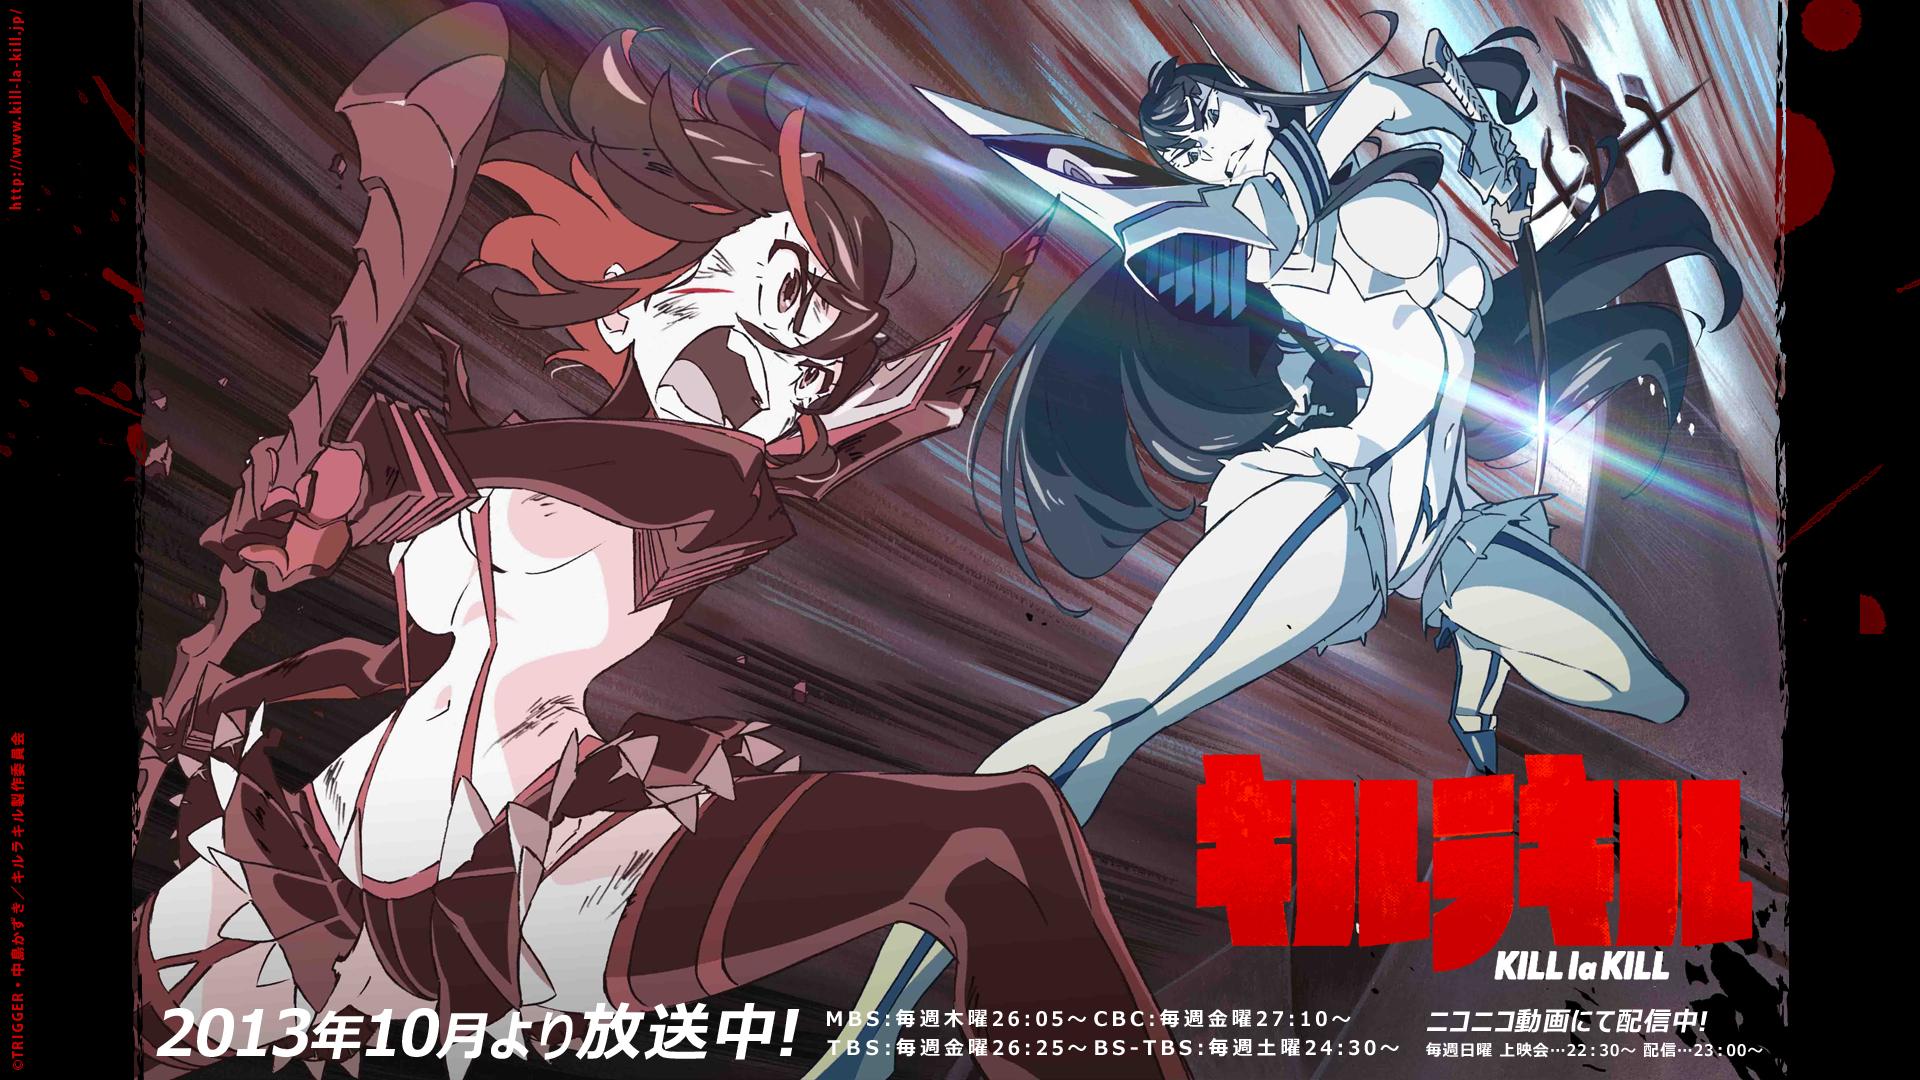 Scissor Blade Kill la Kill   Ryuko vs Satsuki wallpaper 1920x1080 1920x1080